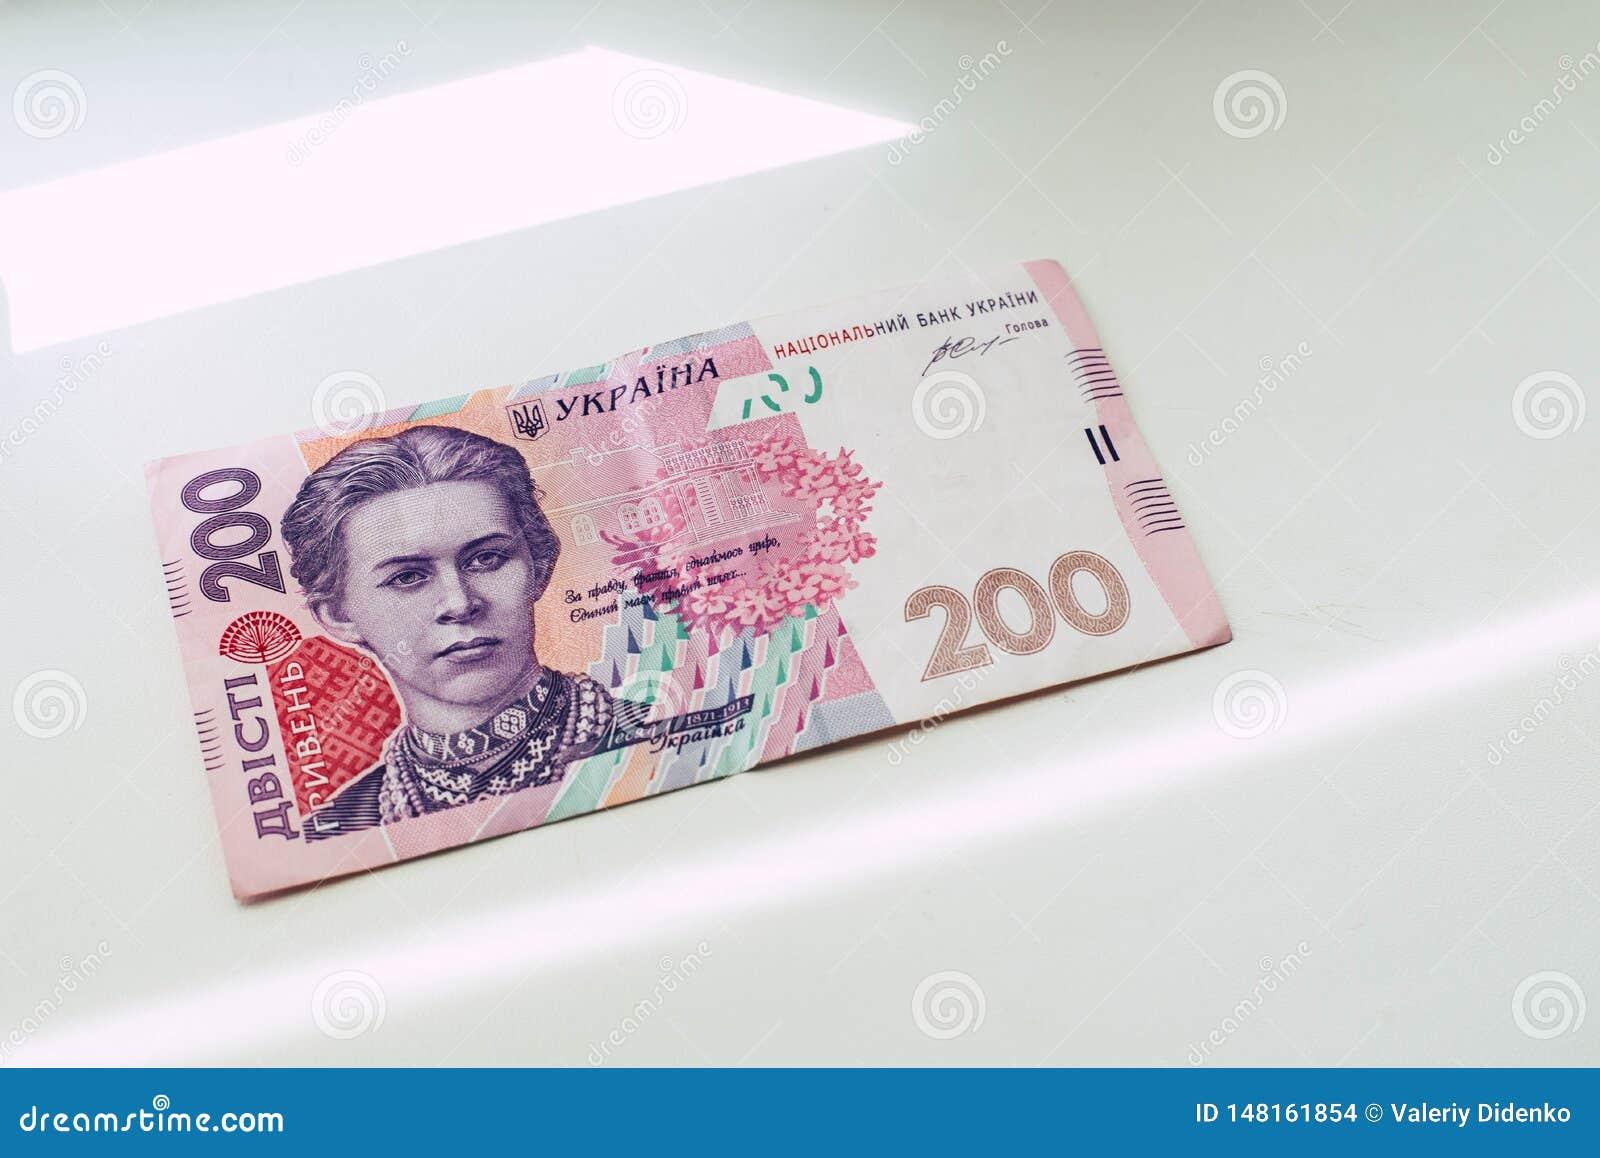 Banknote in 200 Ukrainian hryvnias